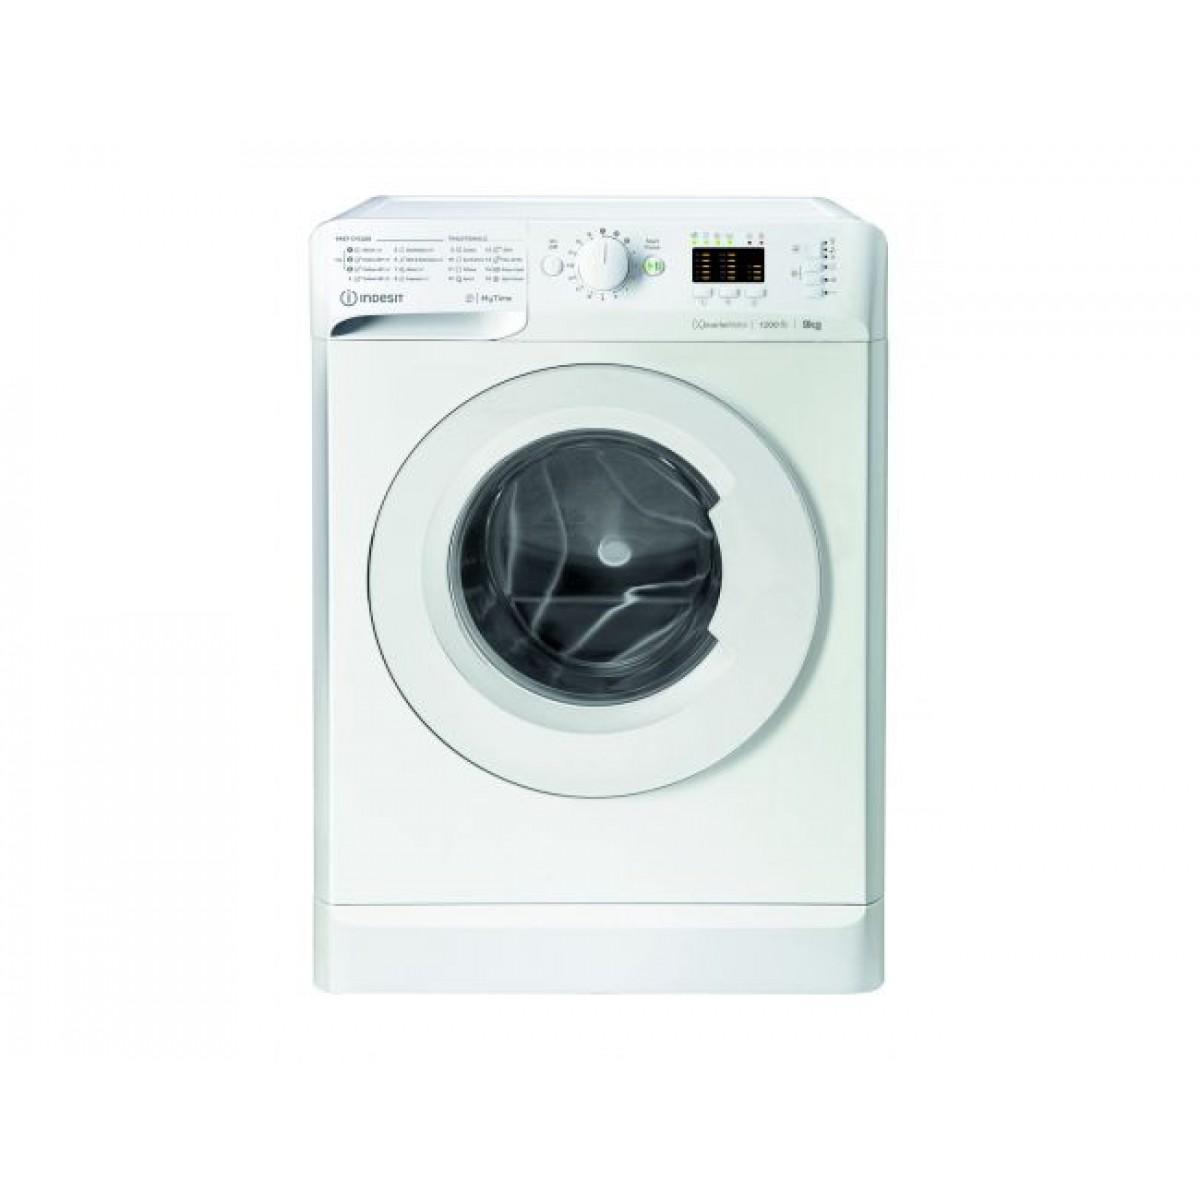 Indesit MTWA 91283 W EE Πλυντήριο Ρούχων Πλυντήρια ρούχων Ηλεκτρικες Συσκευες - homeelectrics.gr